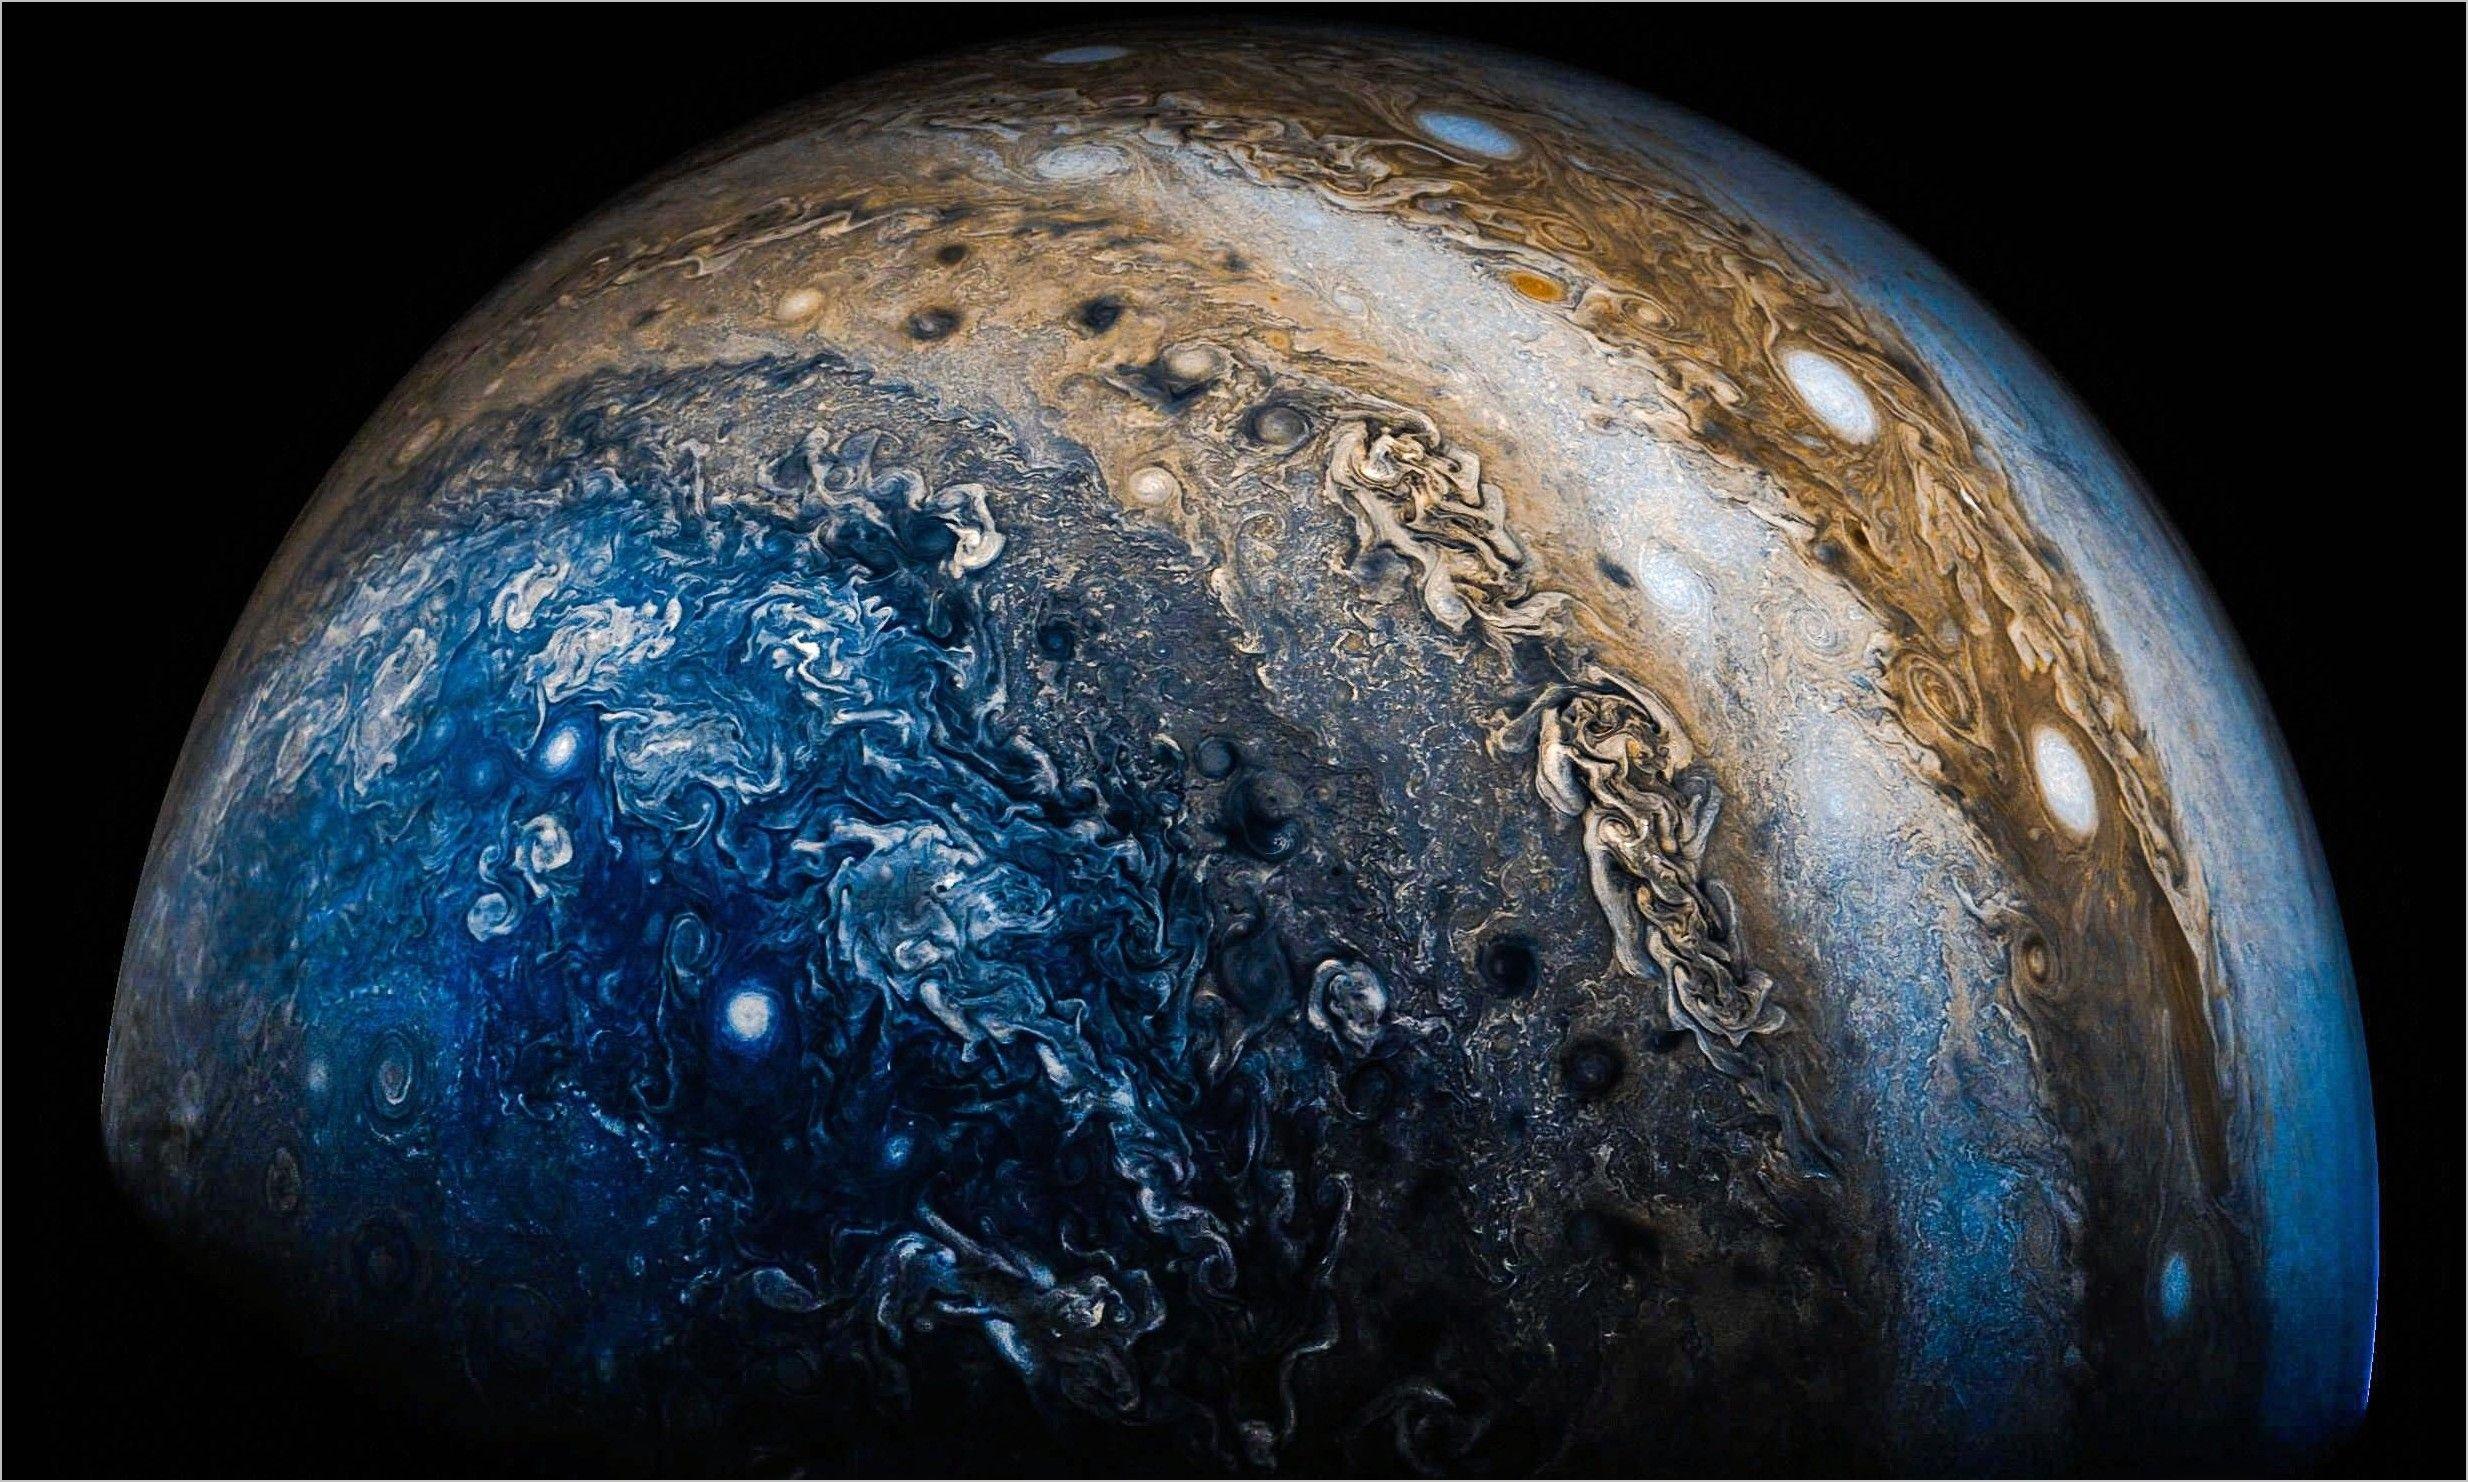 Jupiter Wallpaper 4k Real Image Jupiter Wallpaper Jupiter Planet Planets